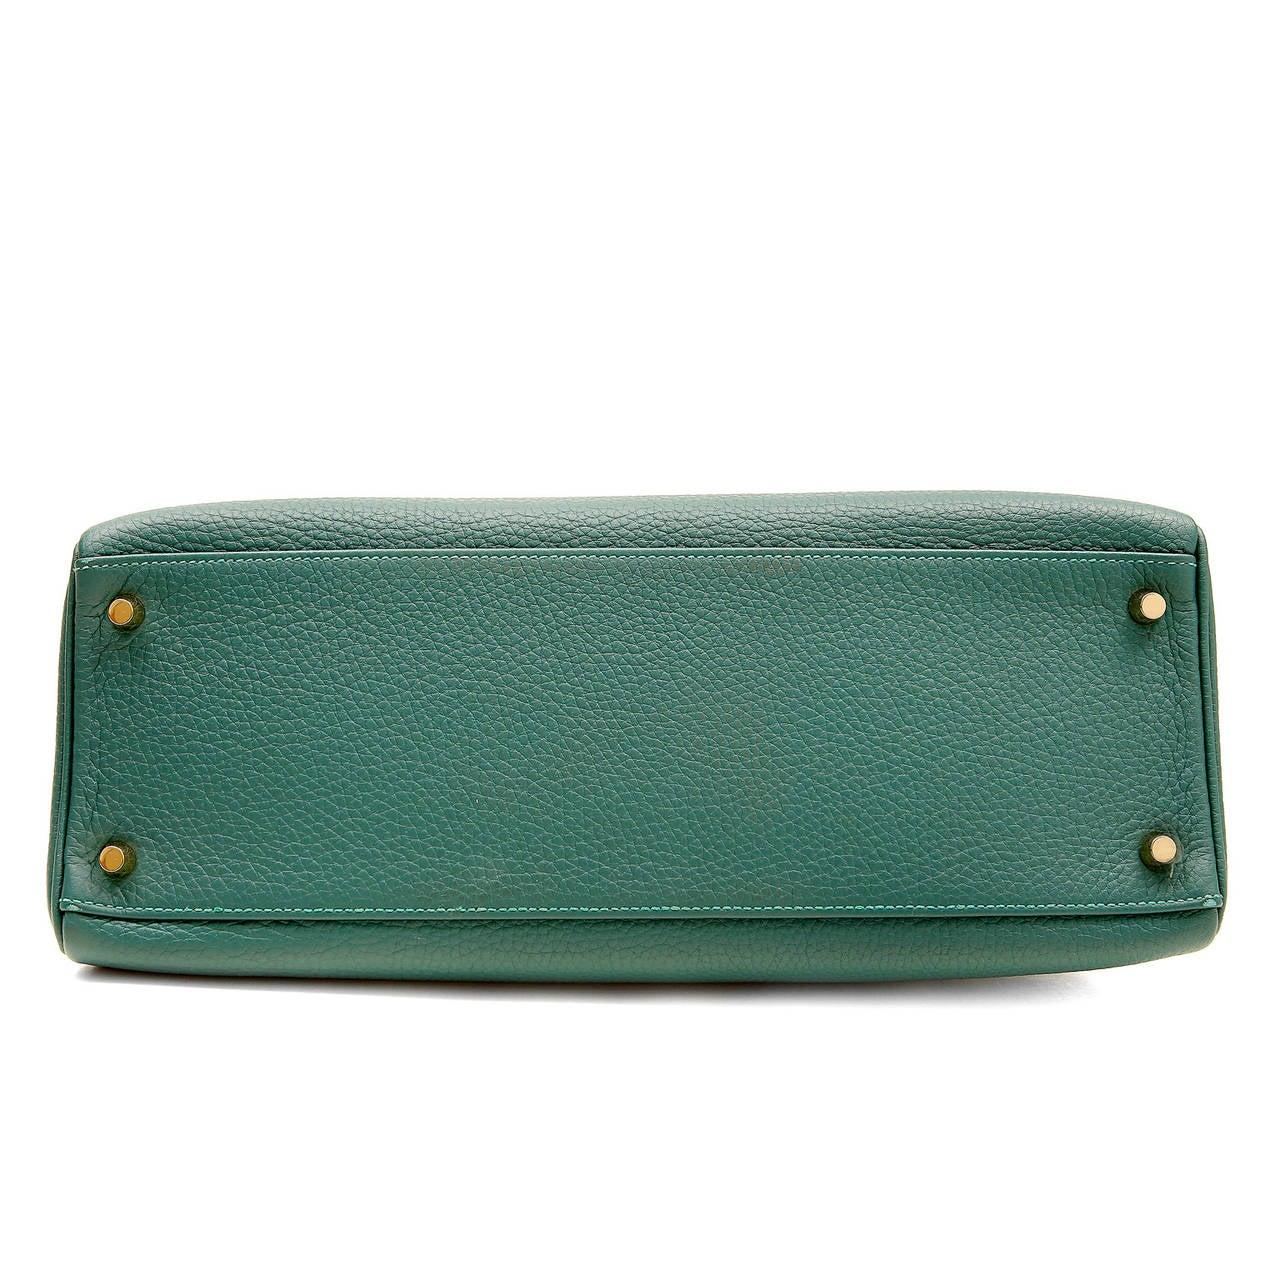 Hermes Malachite Green Togo 35 cm Kelly Bag at 1stdibs